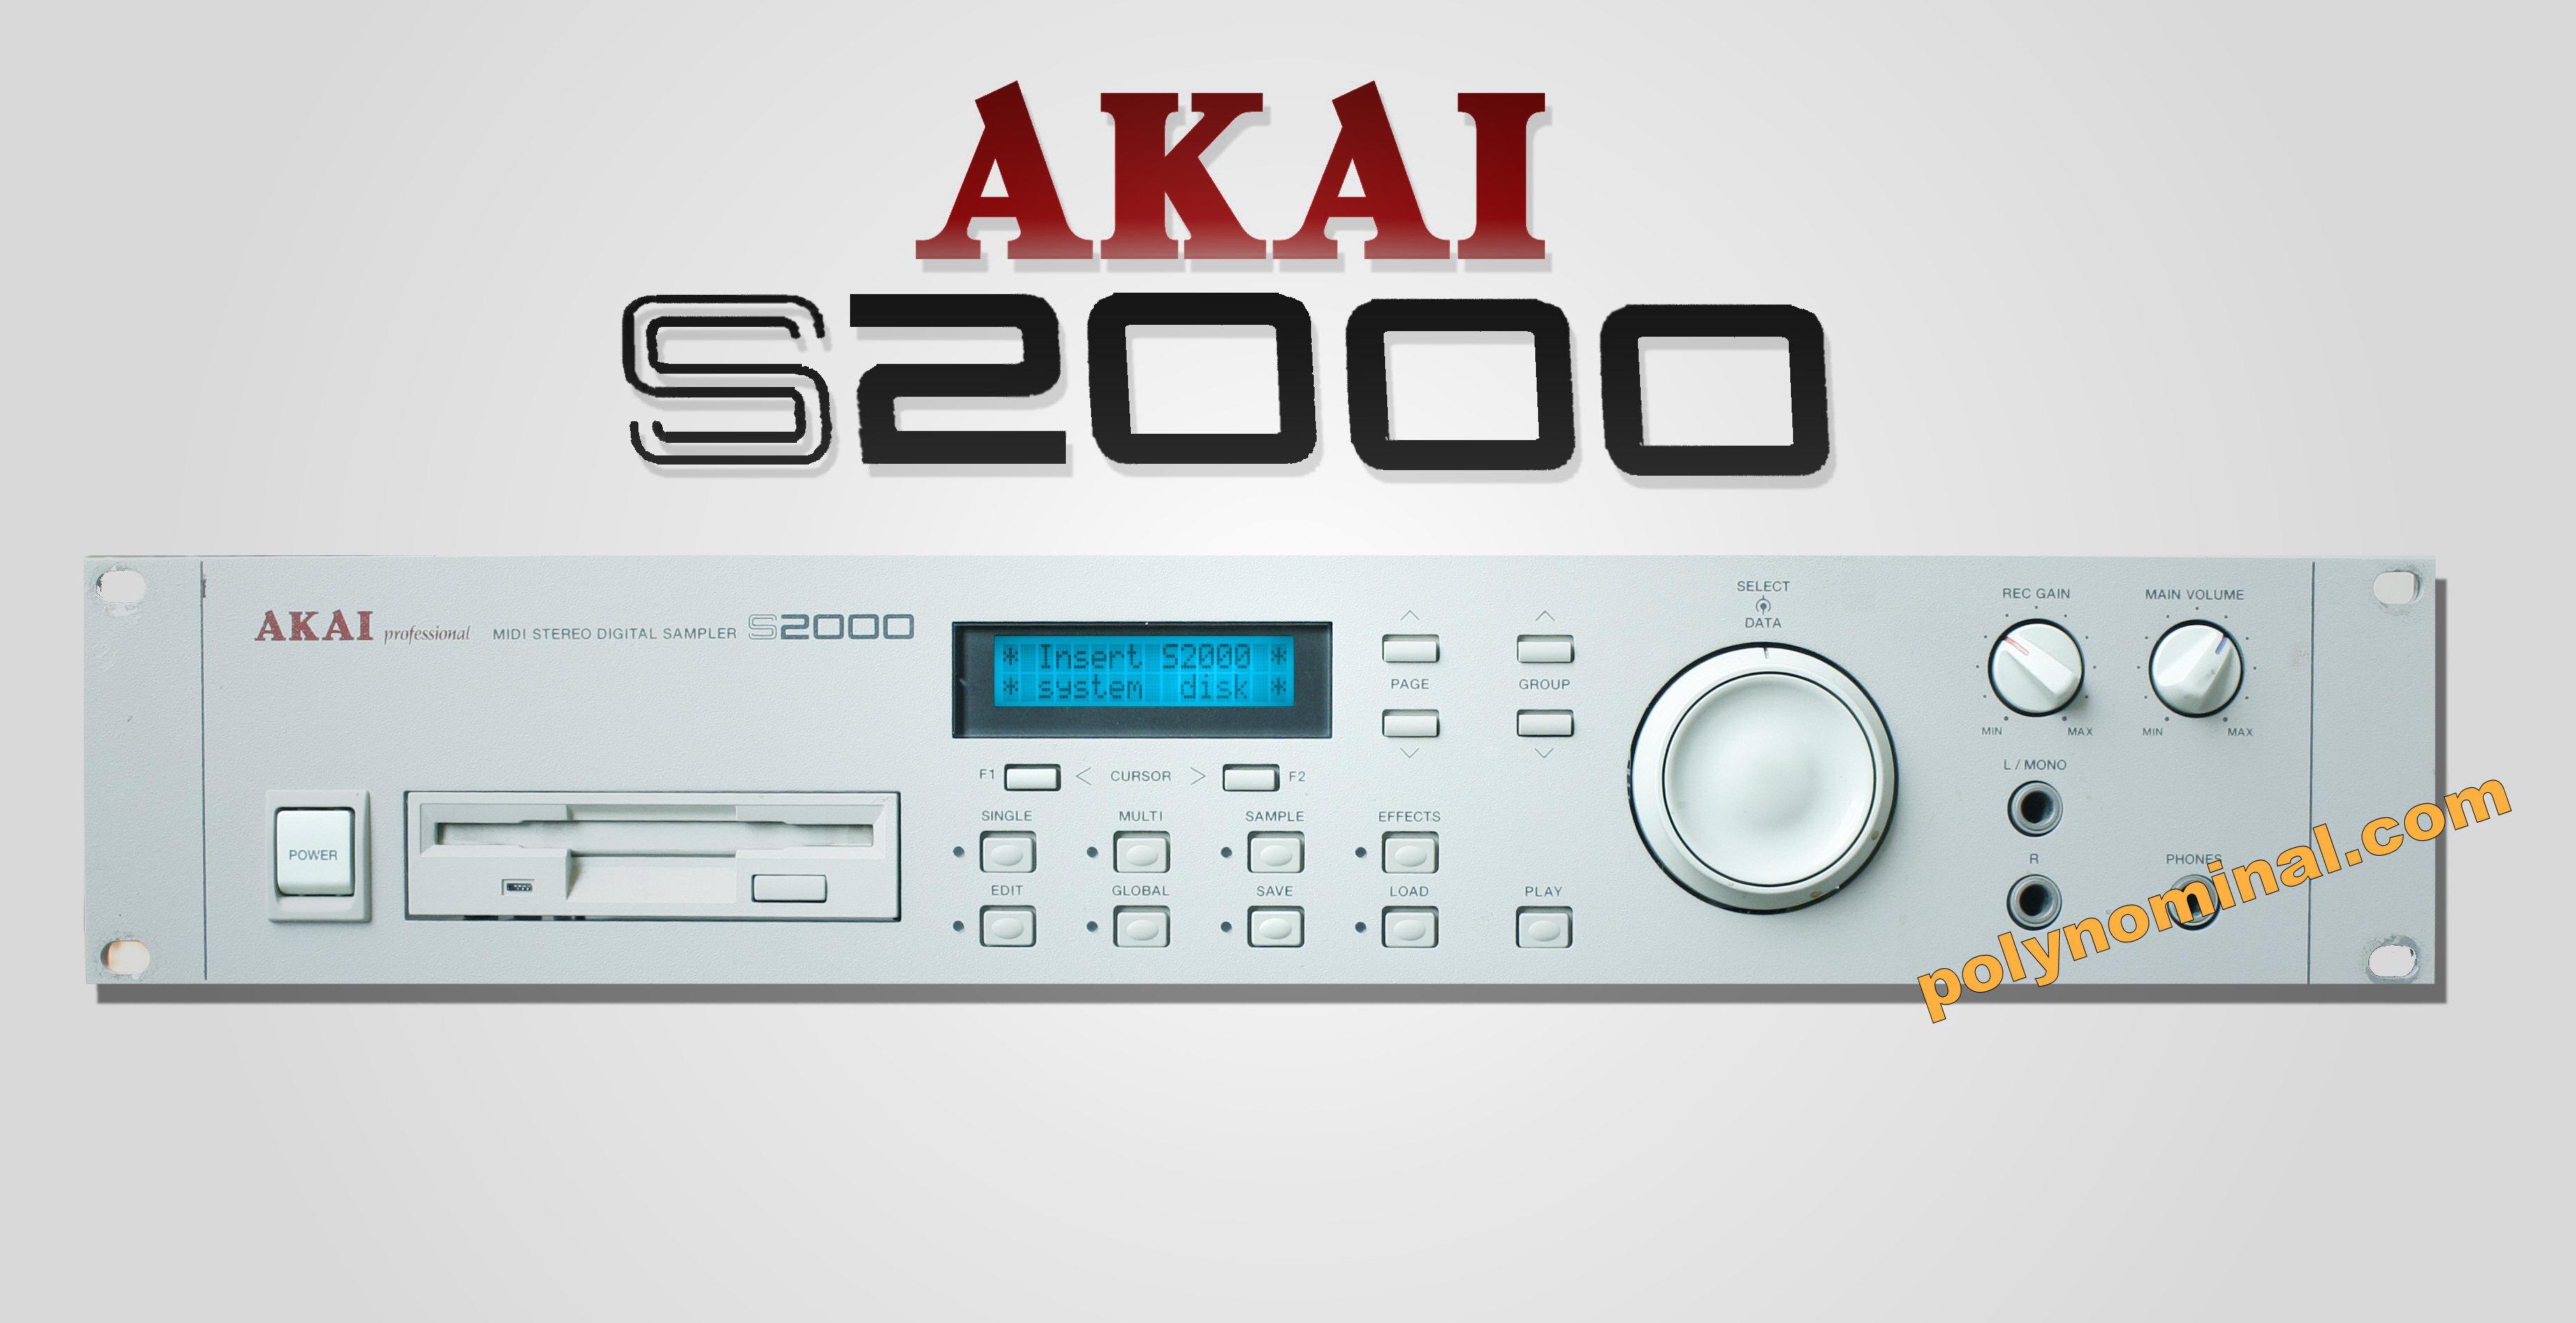 akai s2000 rh polynominal com Akai Z4 Akai Speakers